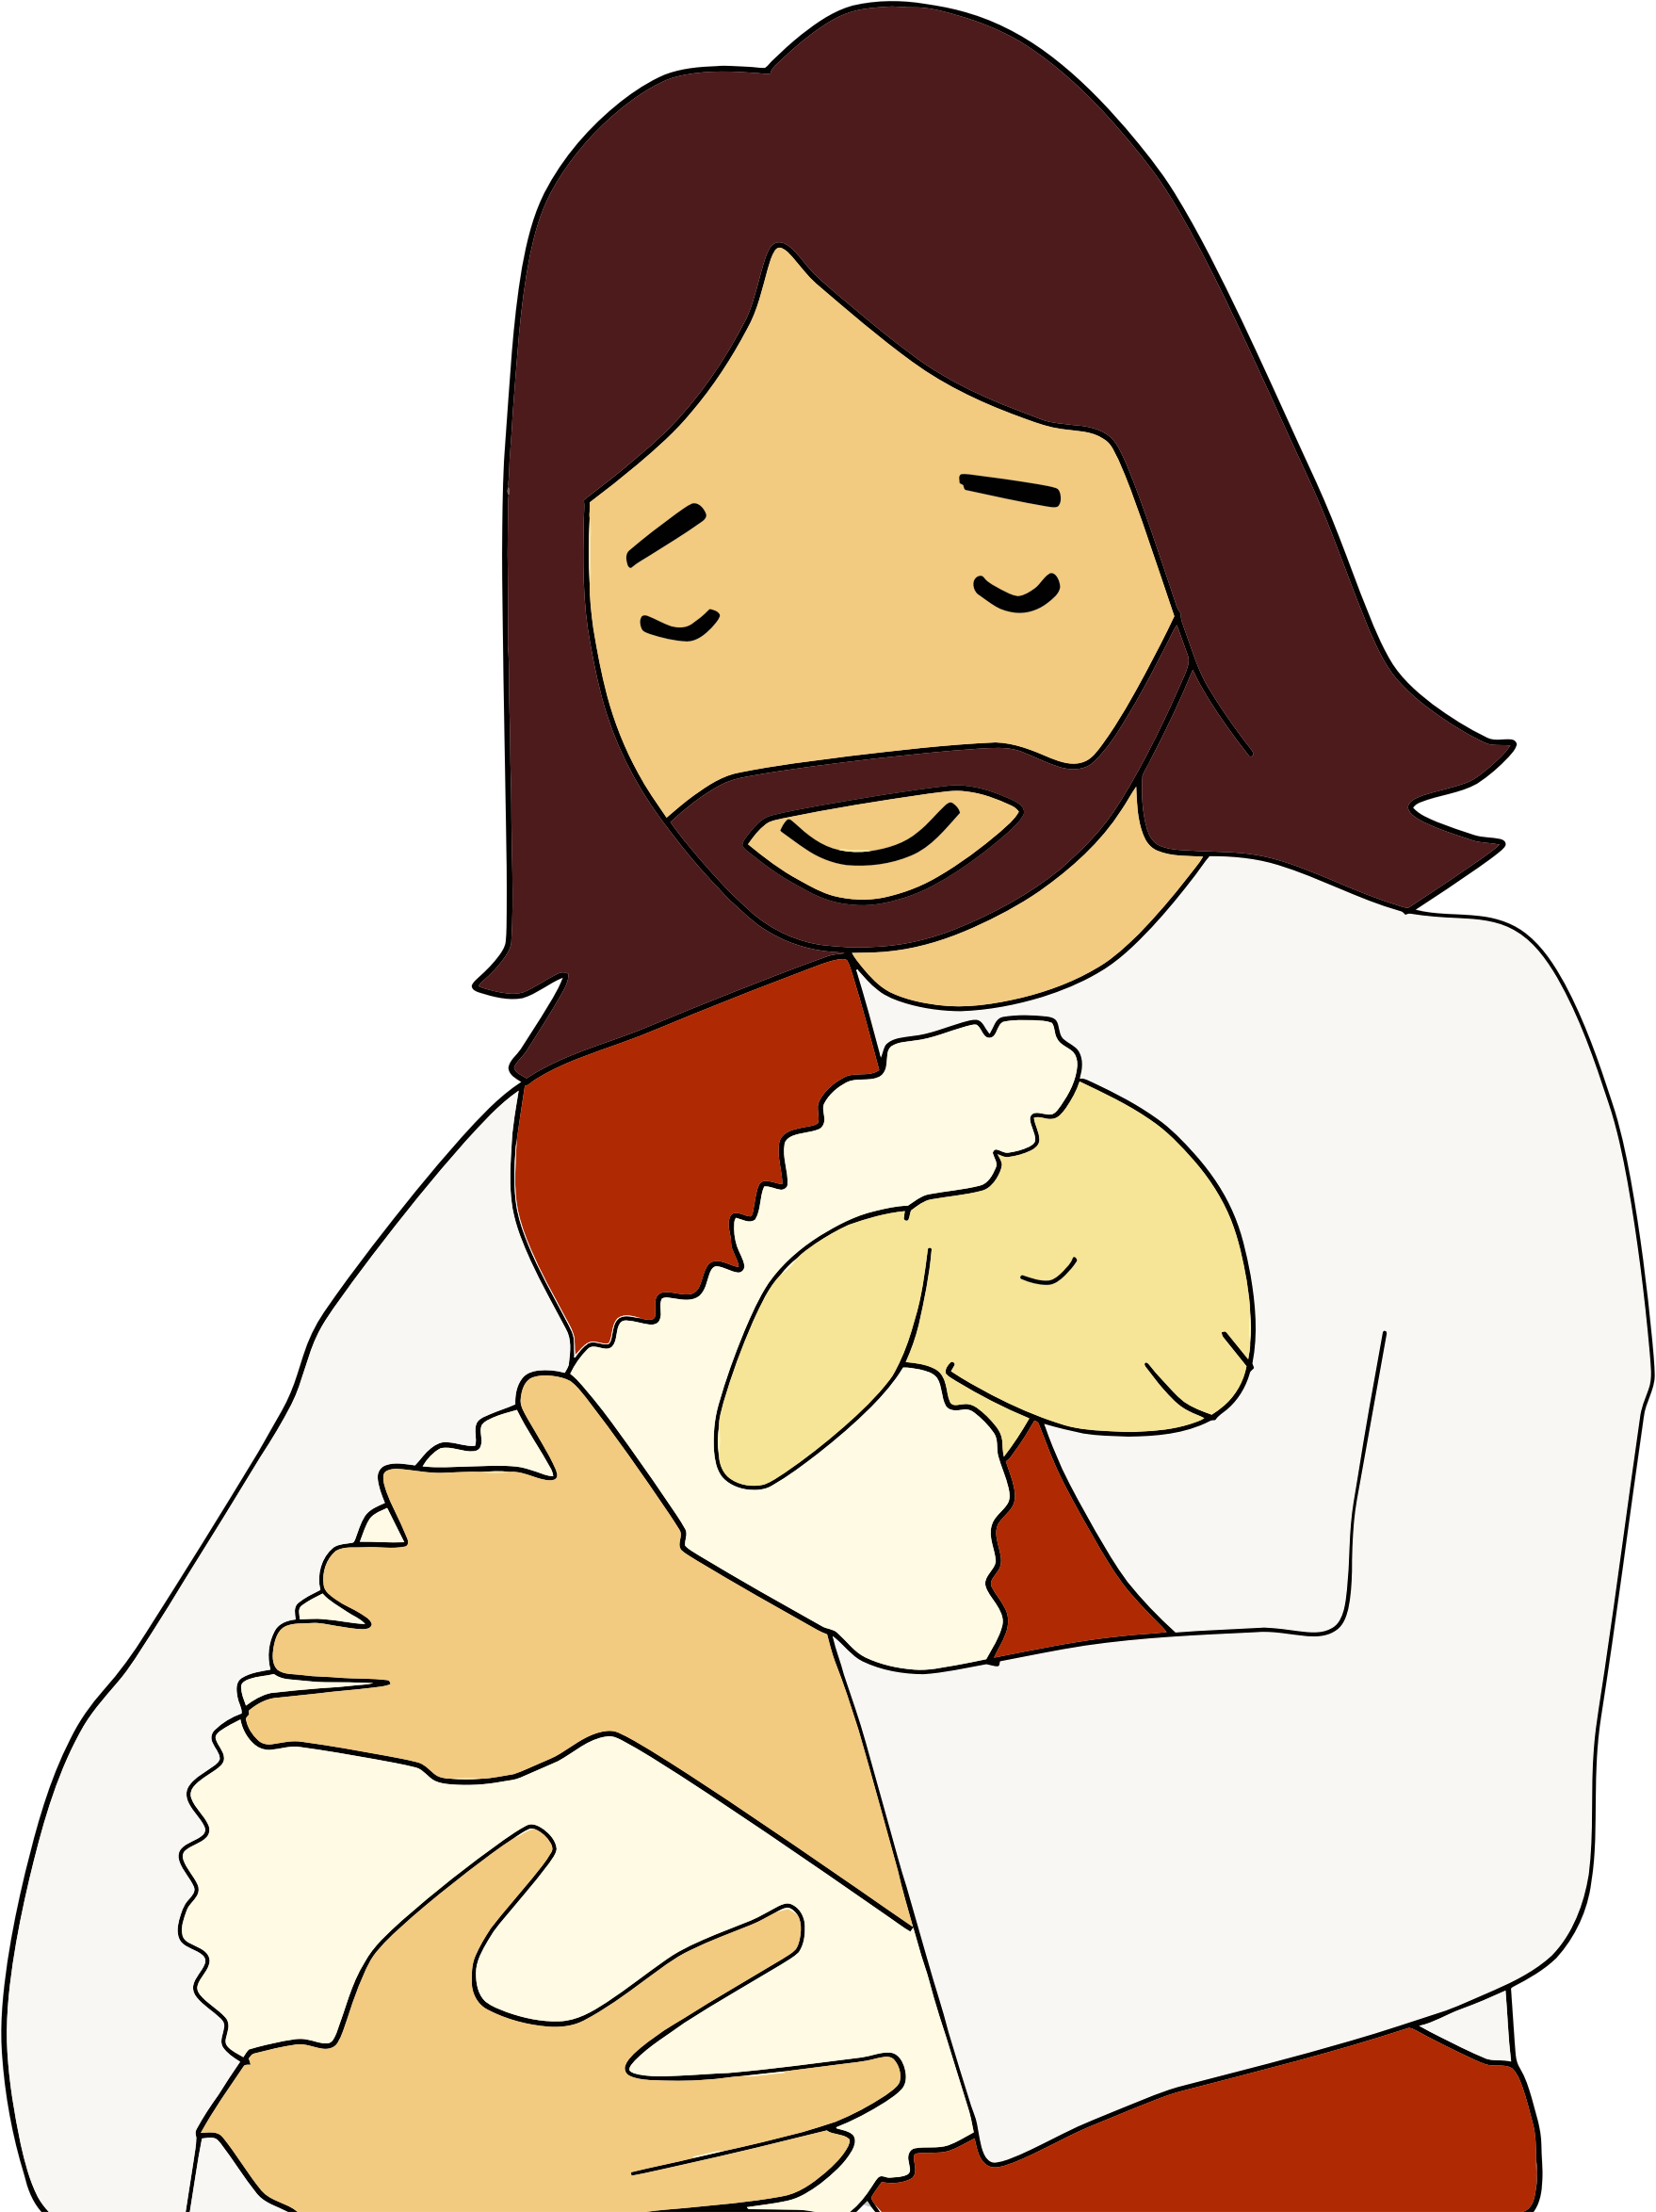 Lamb clipart cross, Lamb cross Transparent FREE for download.